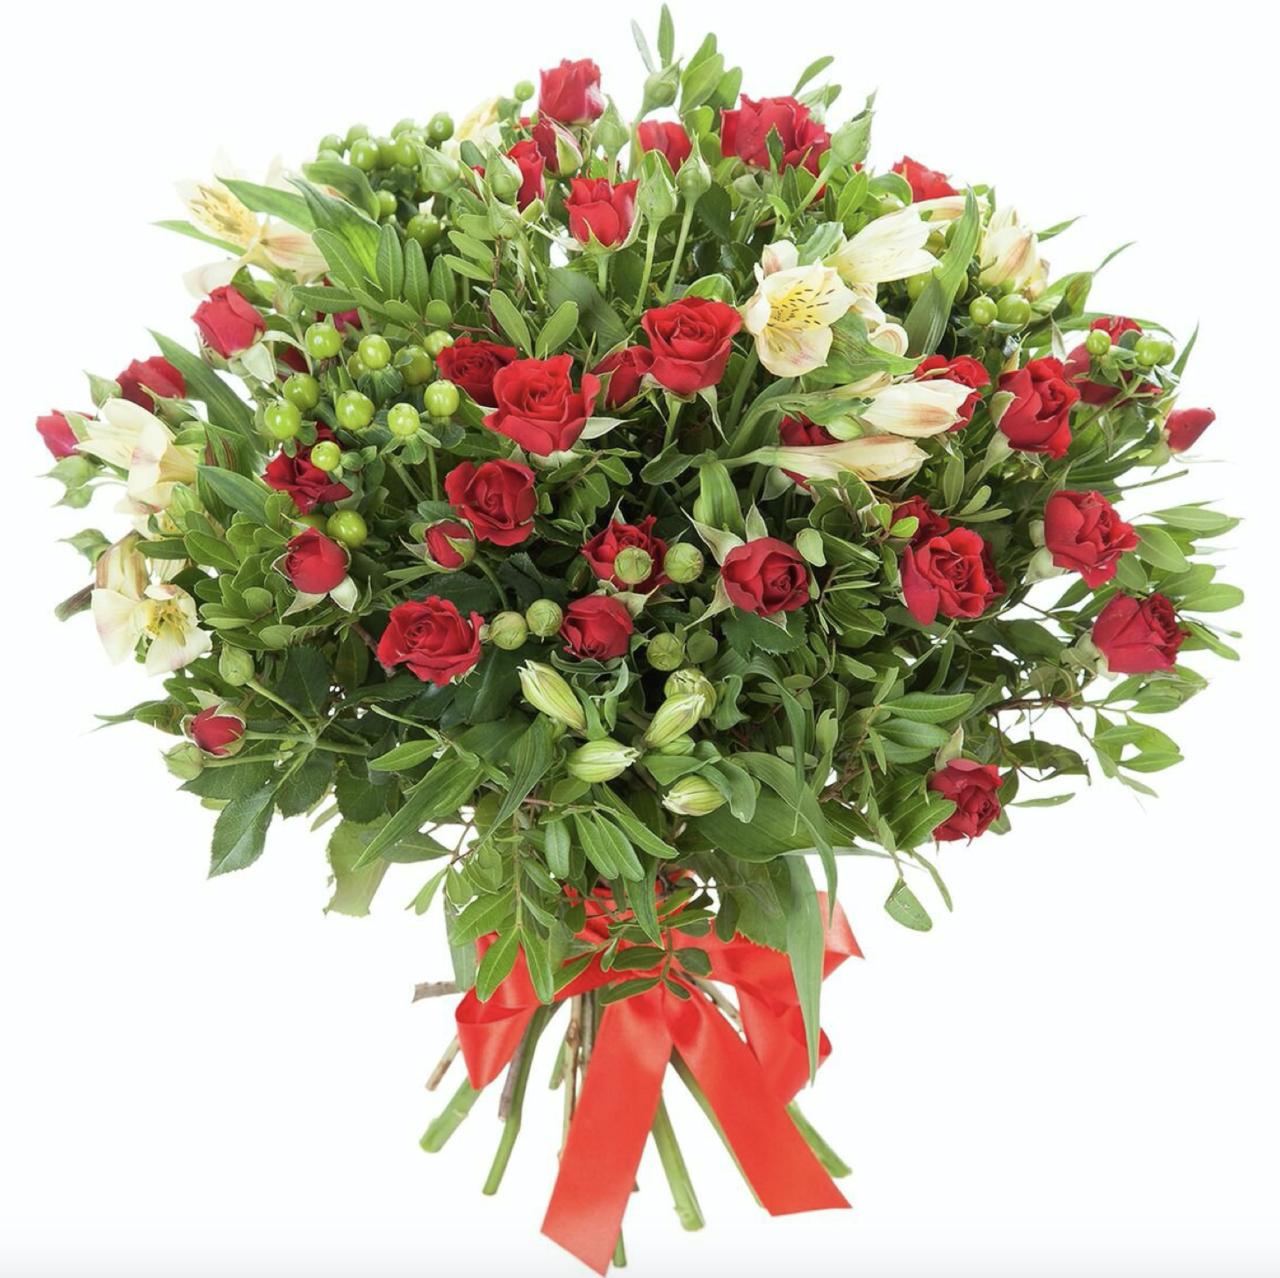 Преимущества сервисов по доставке цветов